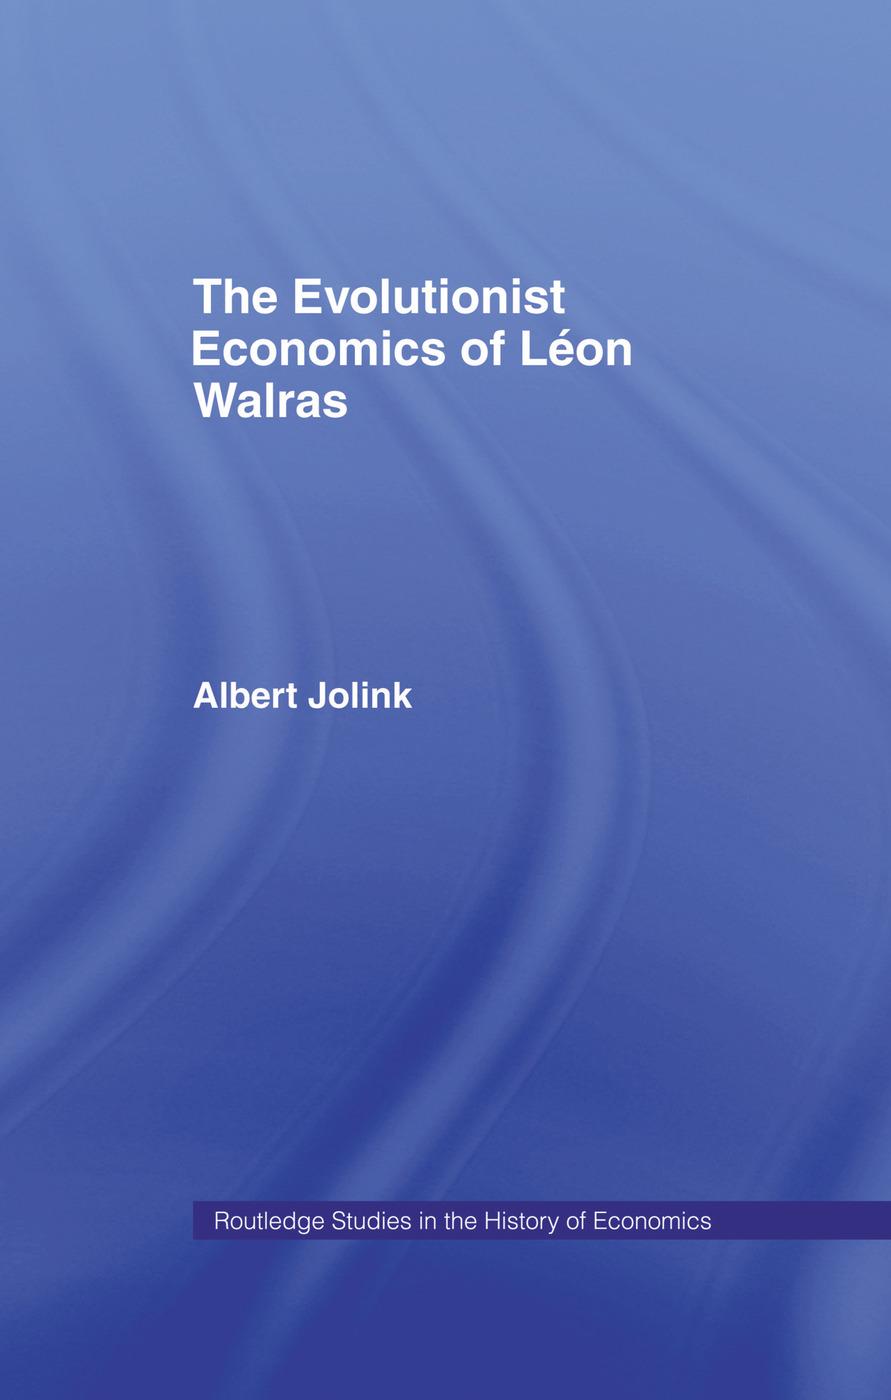 The Evolutionist Economics of Leon Walras: 1st Edition (Paperback) book cover